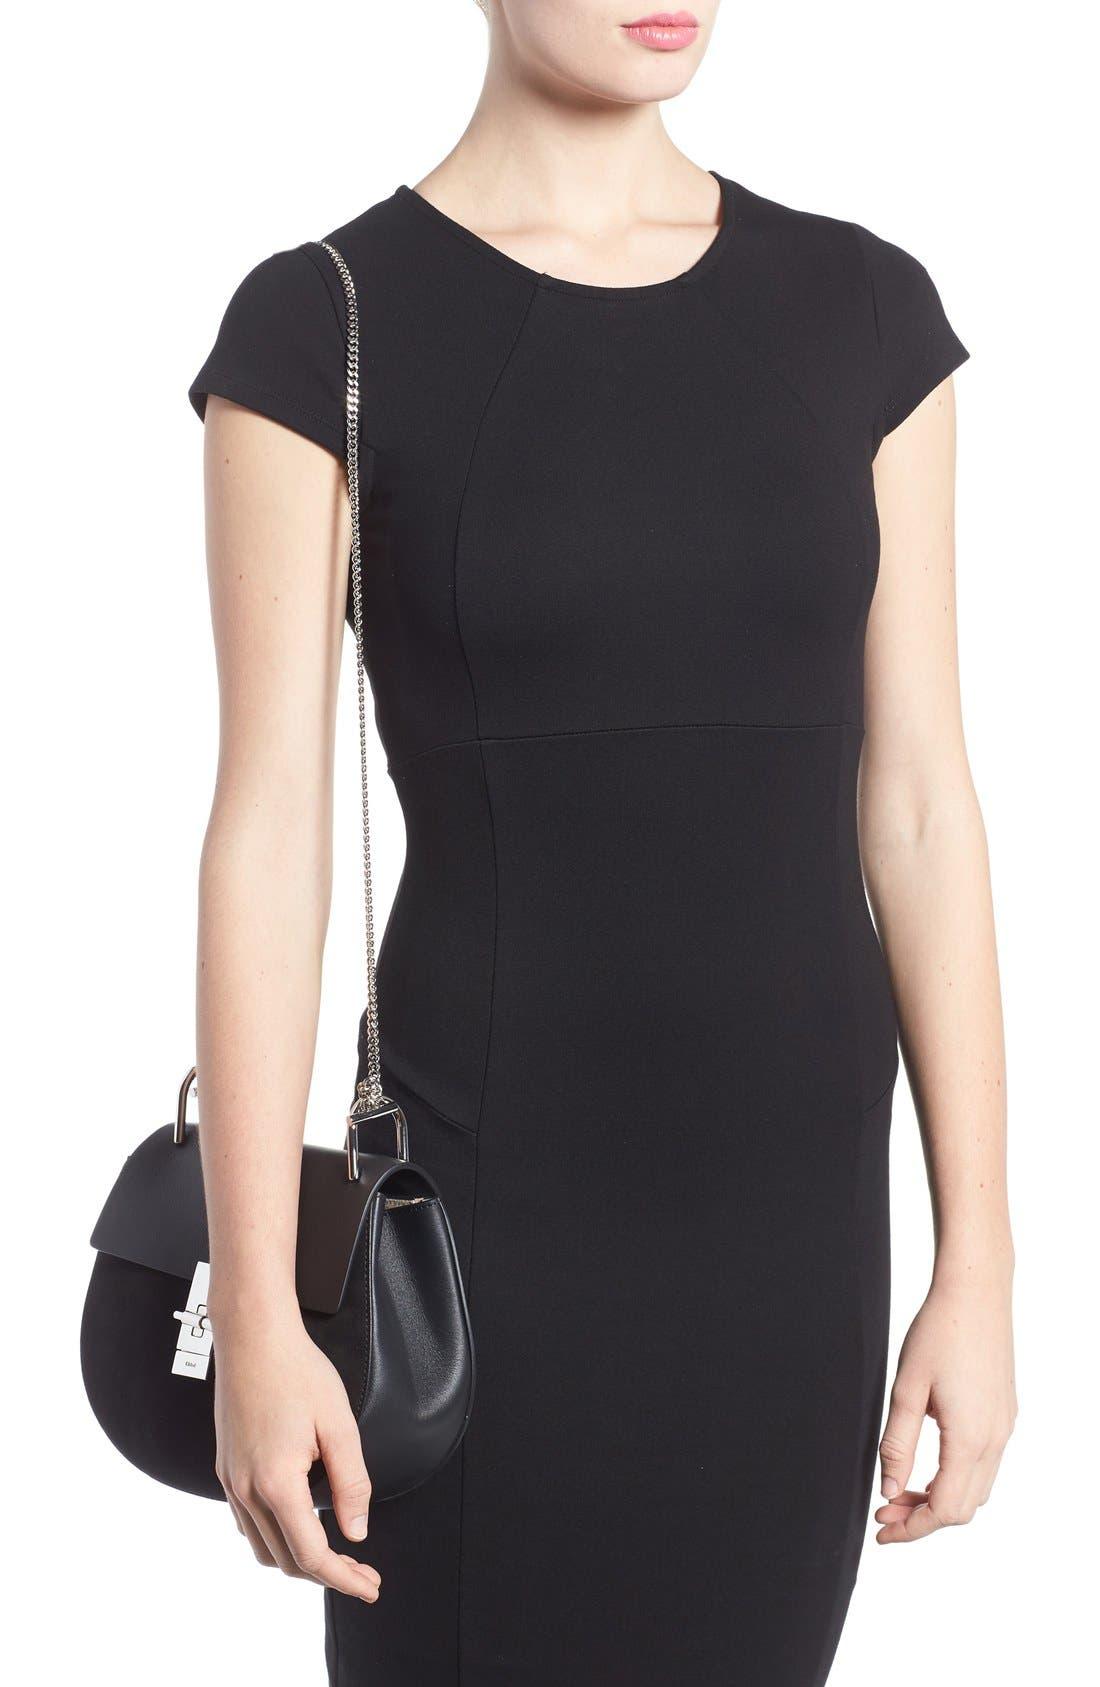 CHLOÉ, Small Drew Leather & Suede Shoulder Bag, Alternate thumbnail 2, color, 001